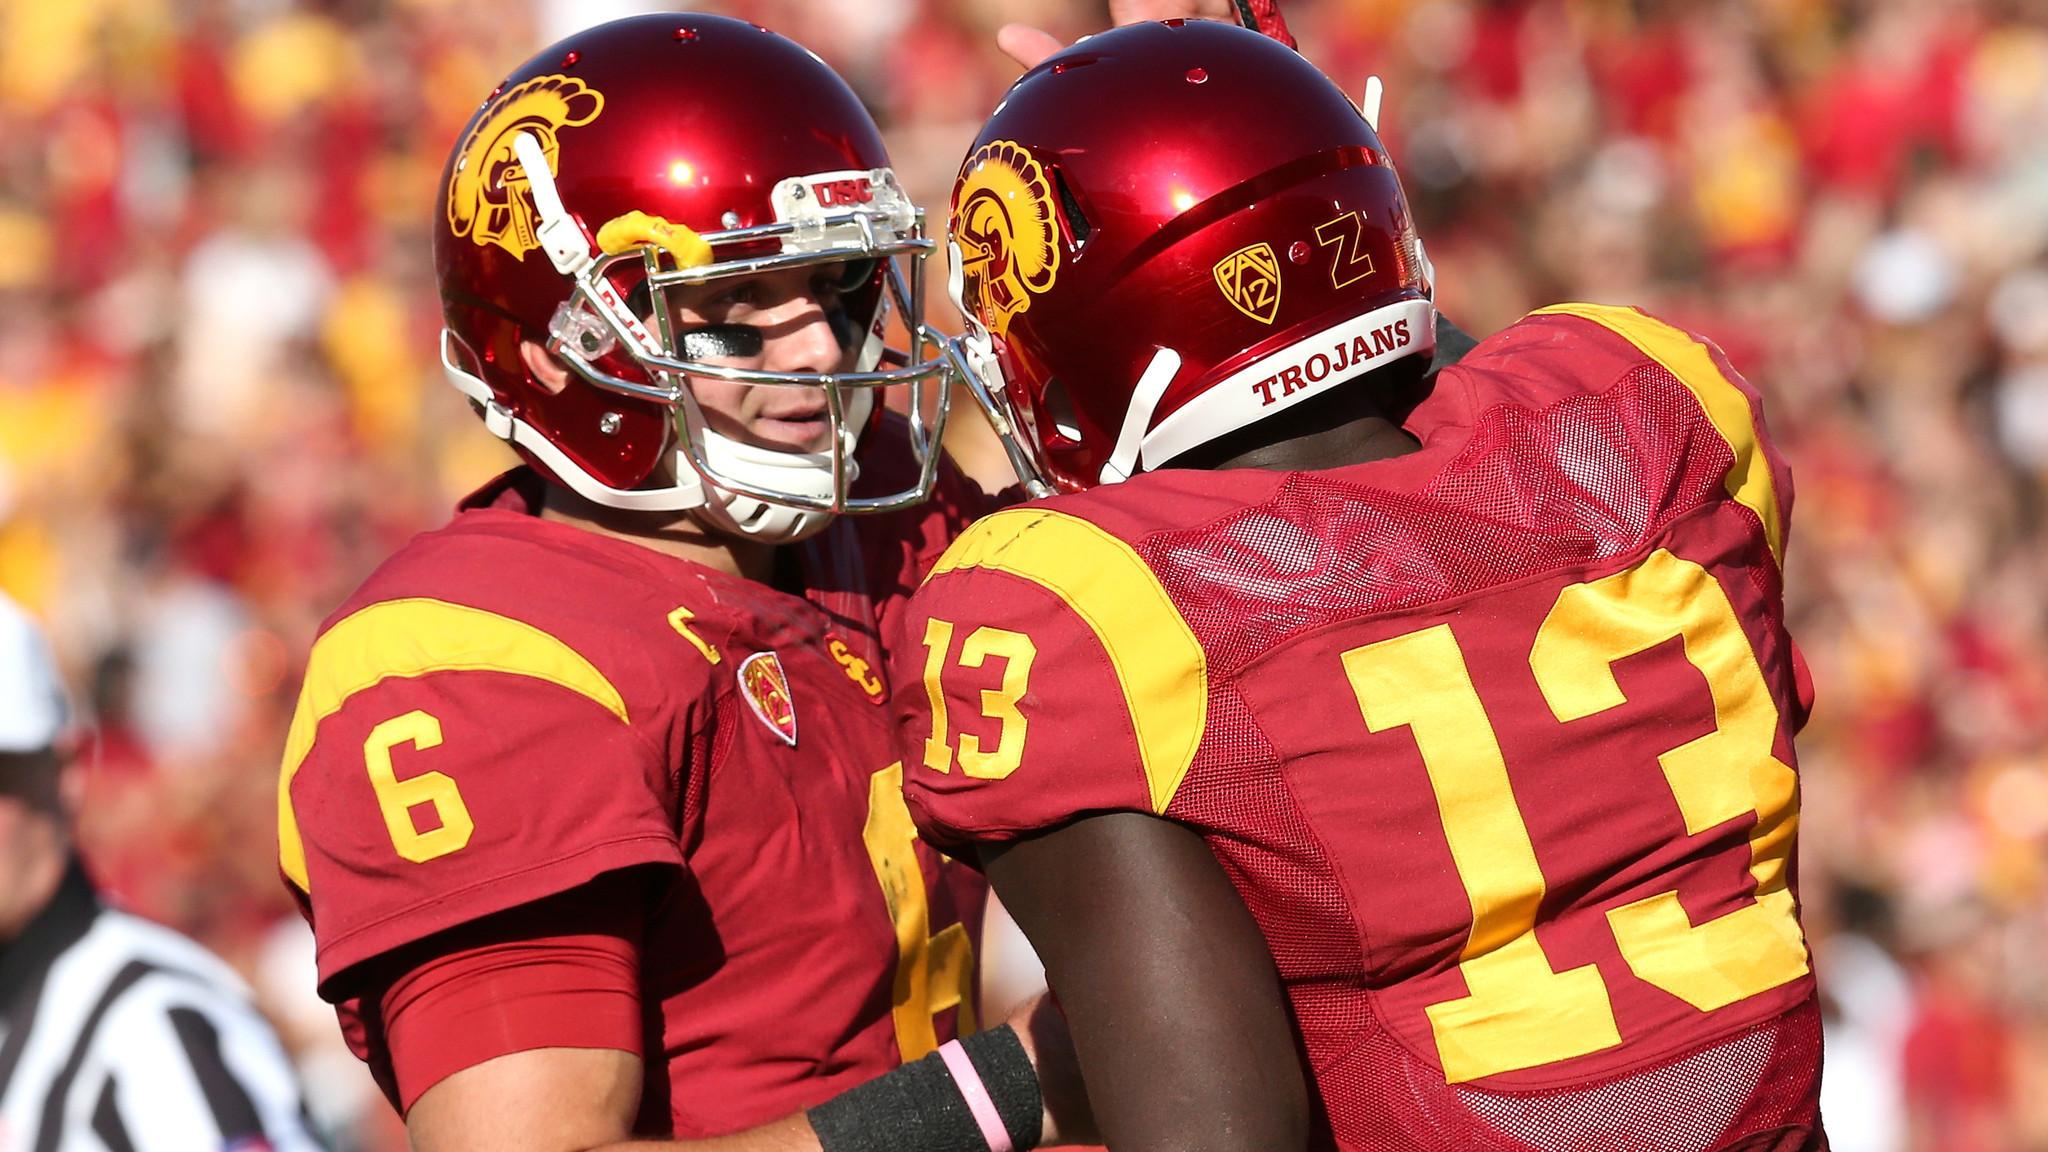 Sack-happy Utah will try to turn Trojans into sad-sacks